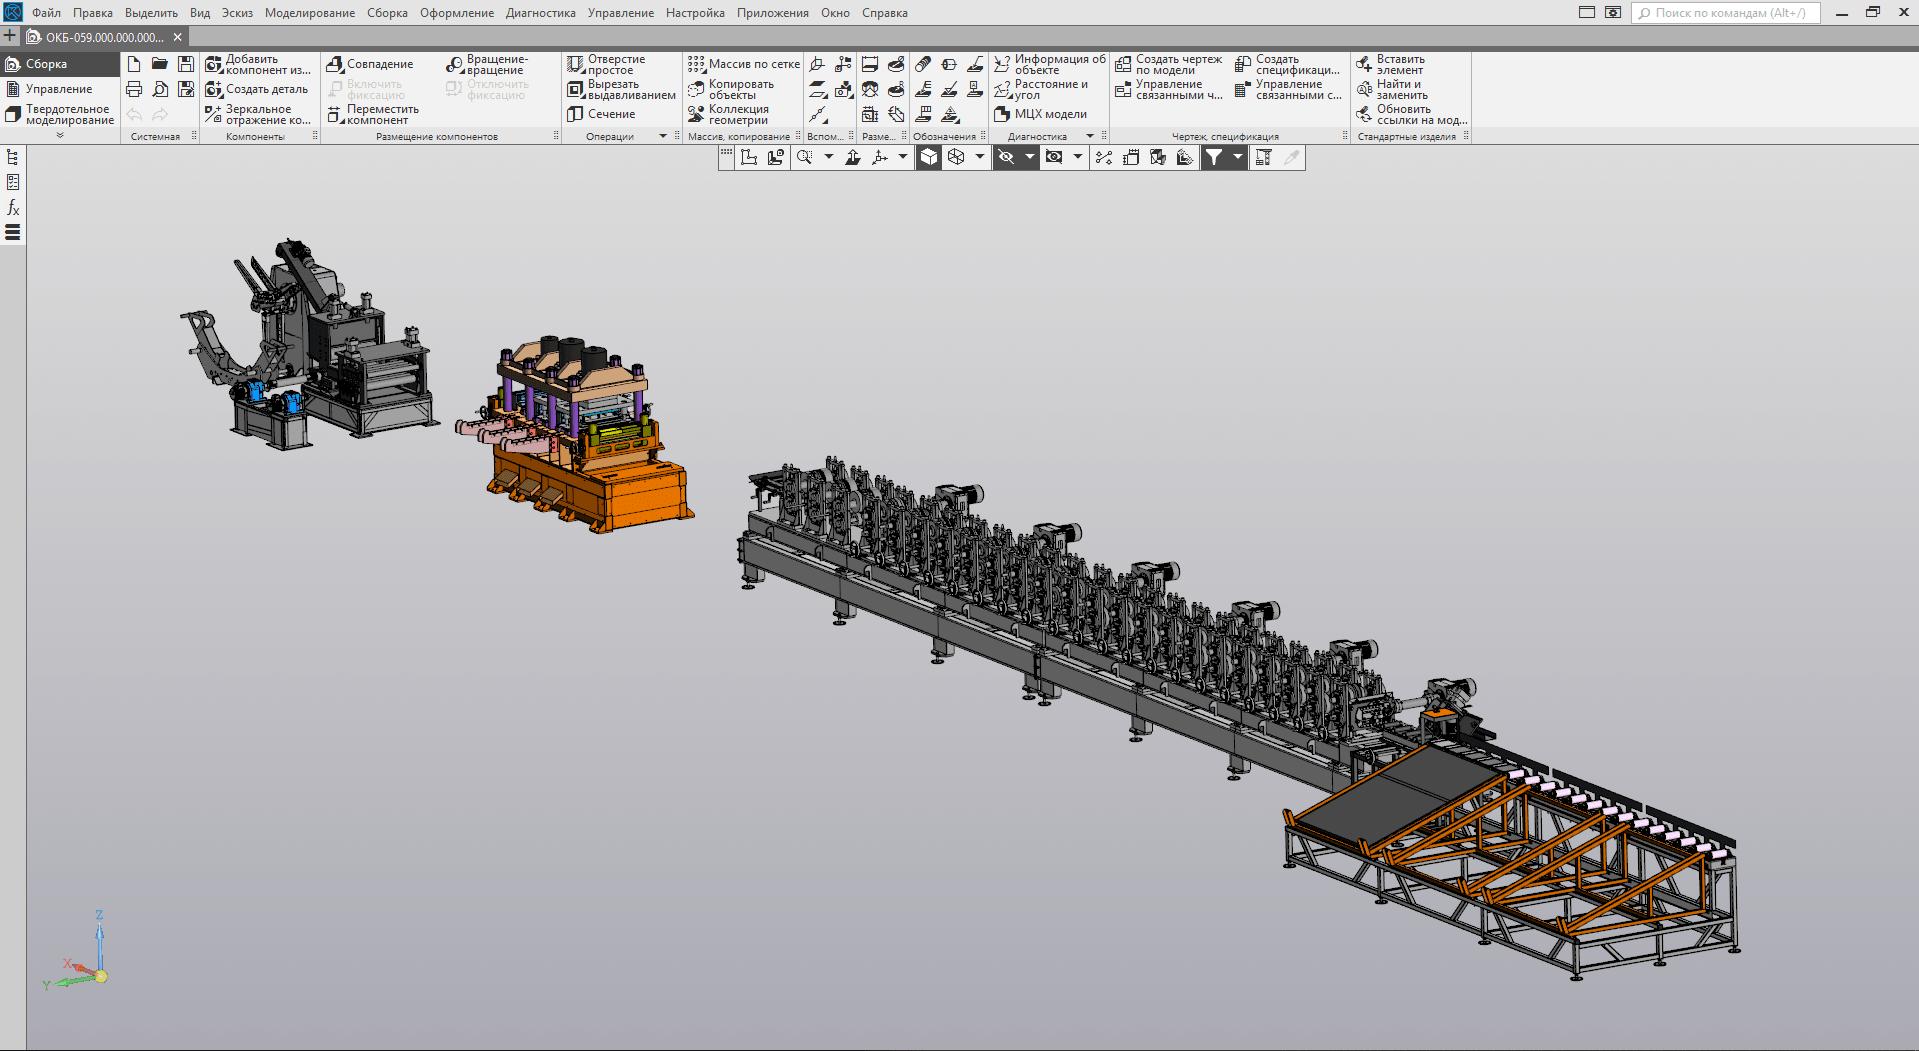 2807101-compressor